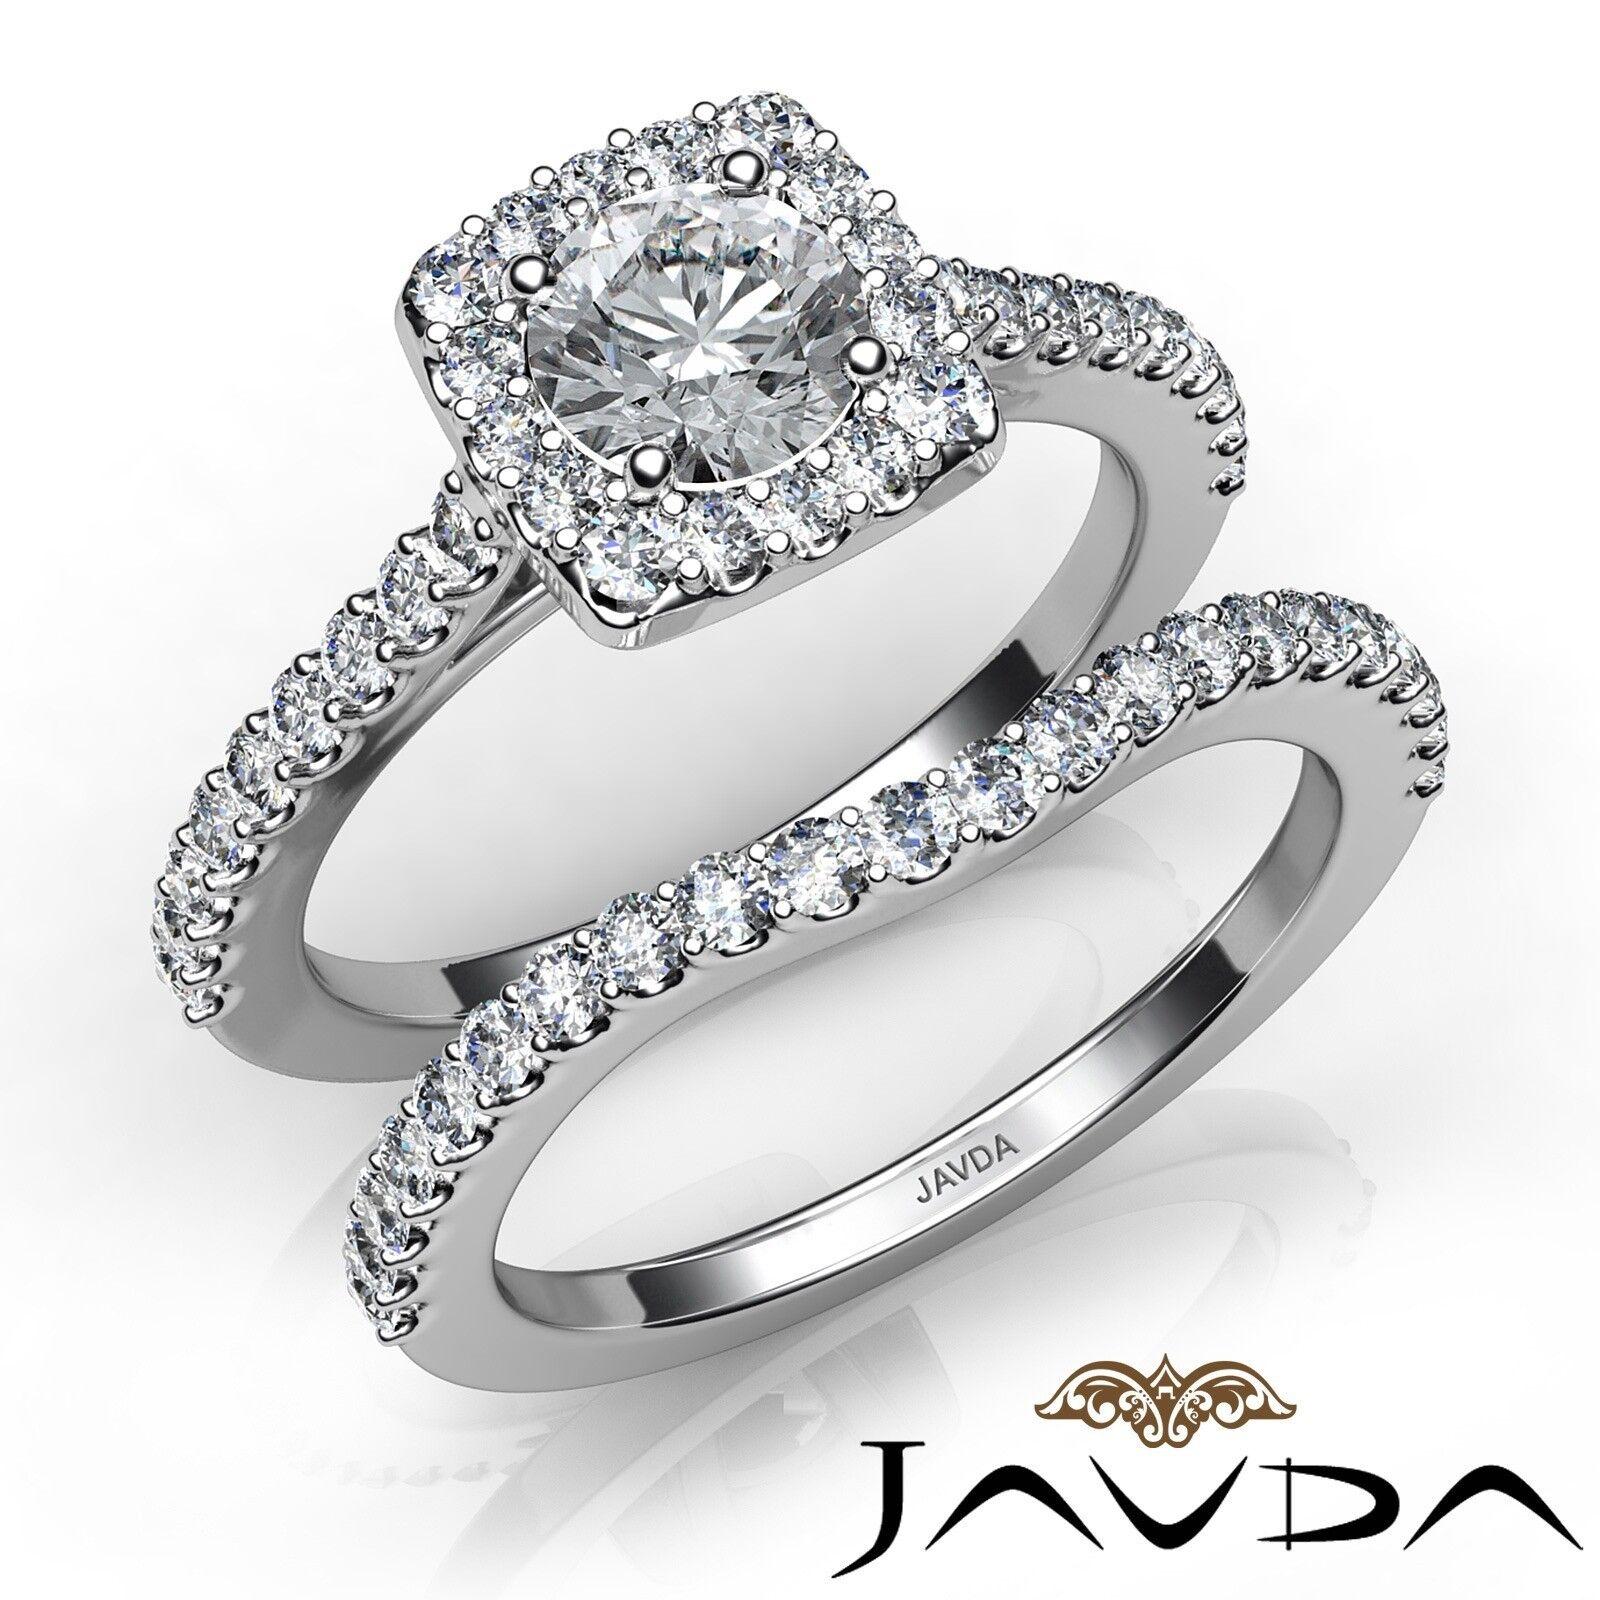 1.53ctw Halo U Prong Bridal Set Round Diamond Engagement Ring GIA J-VS2 W Gold